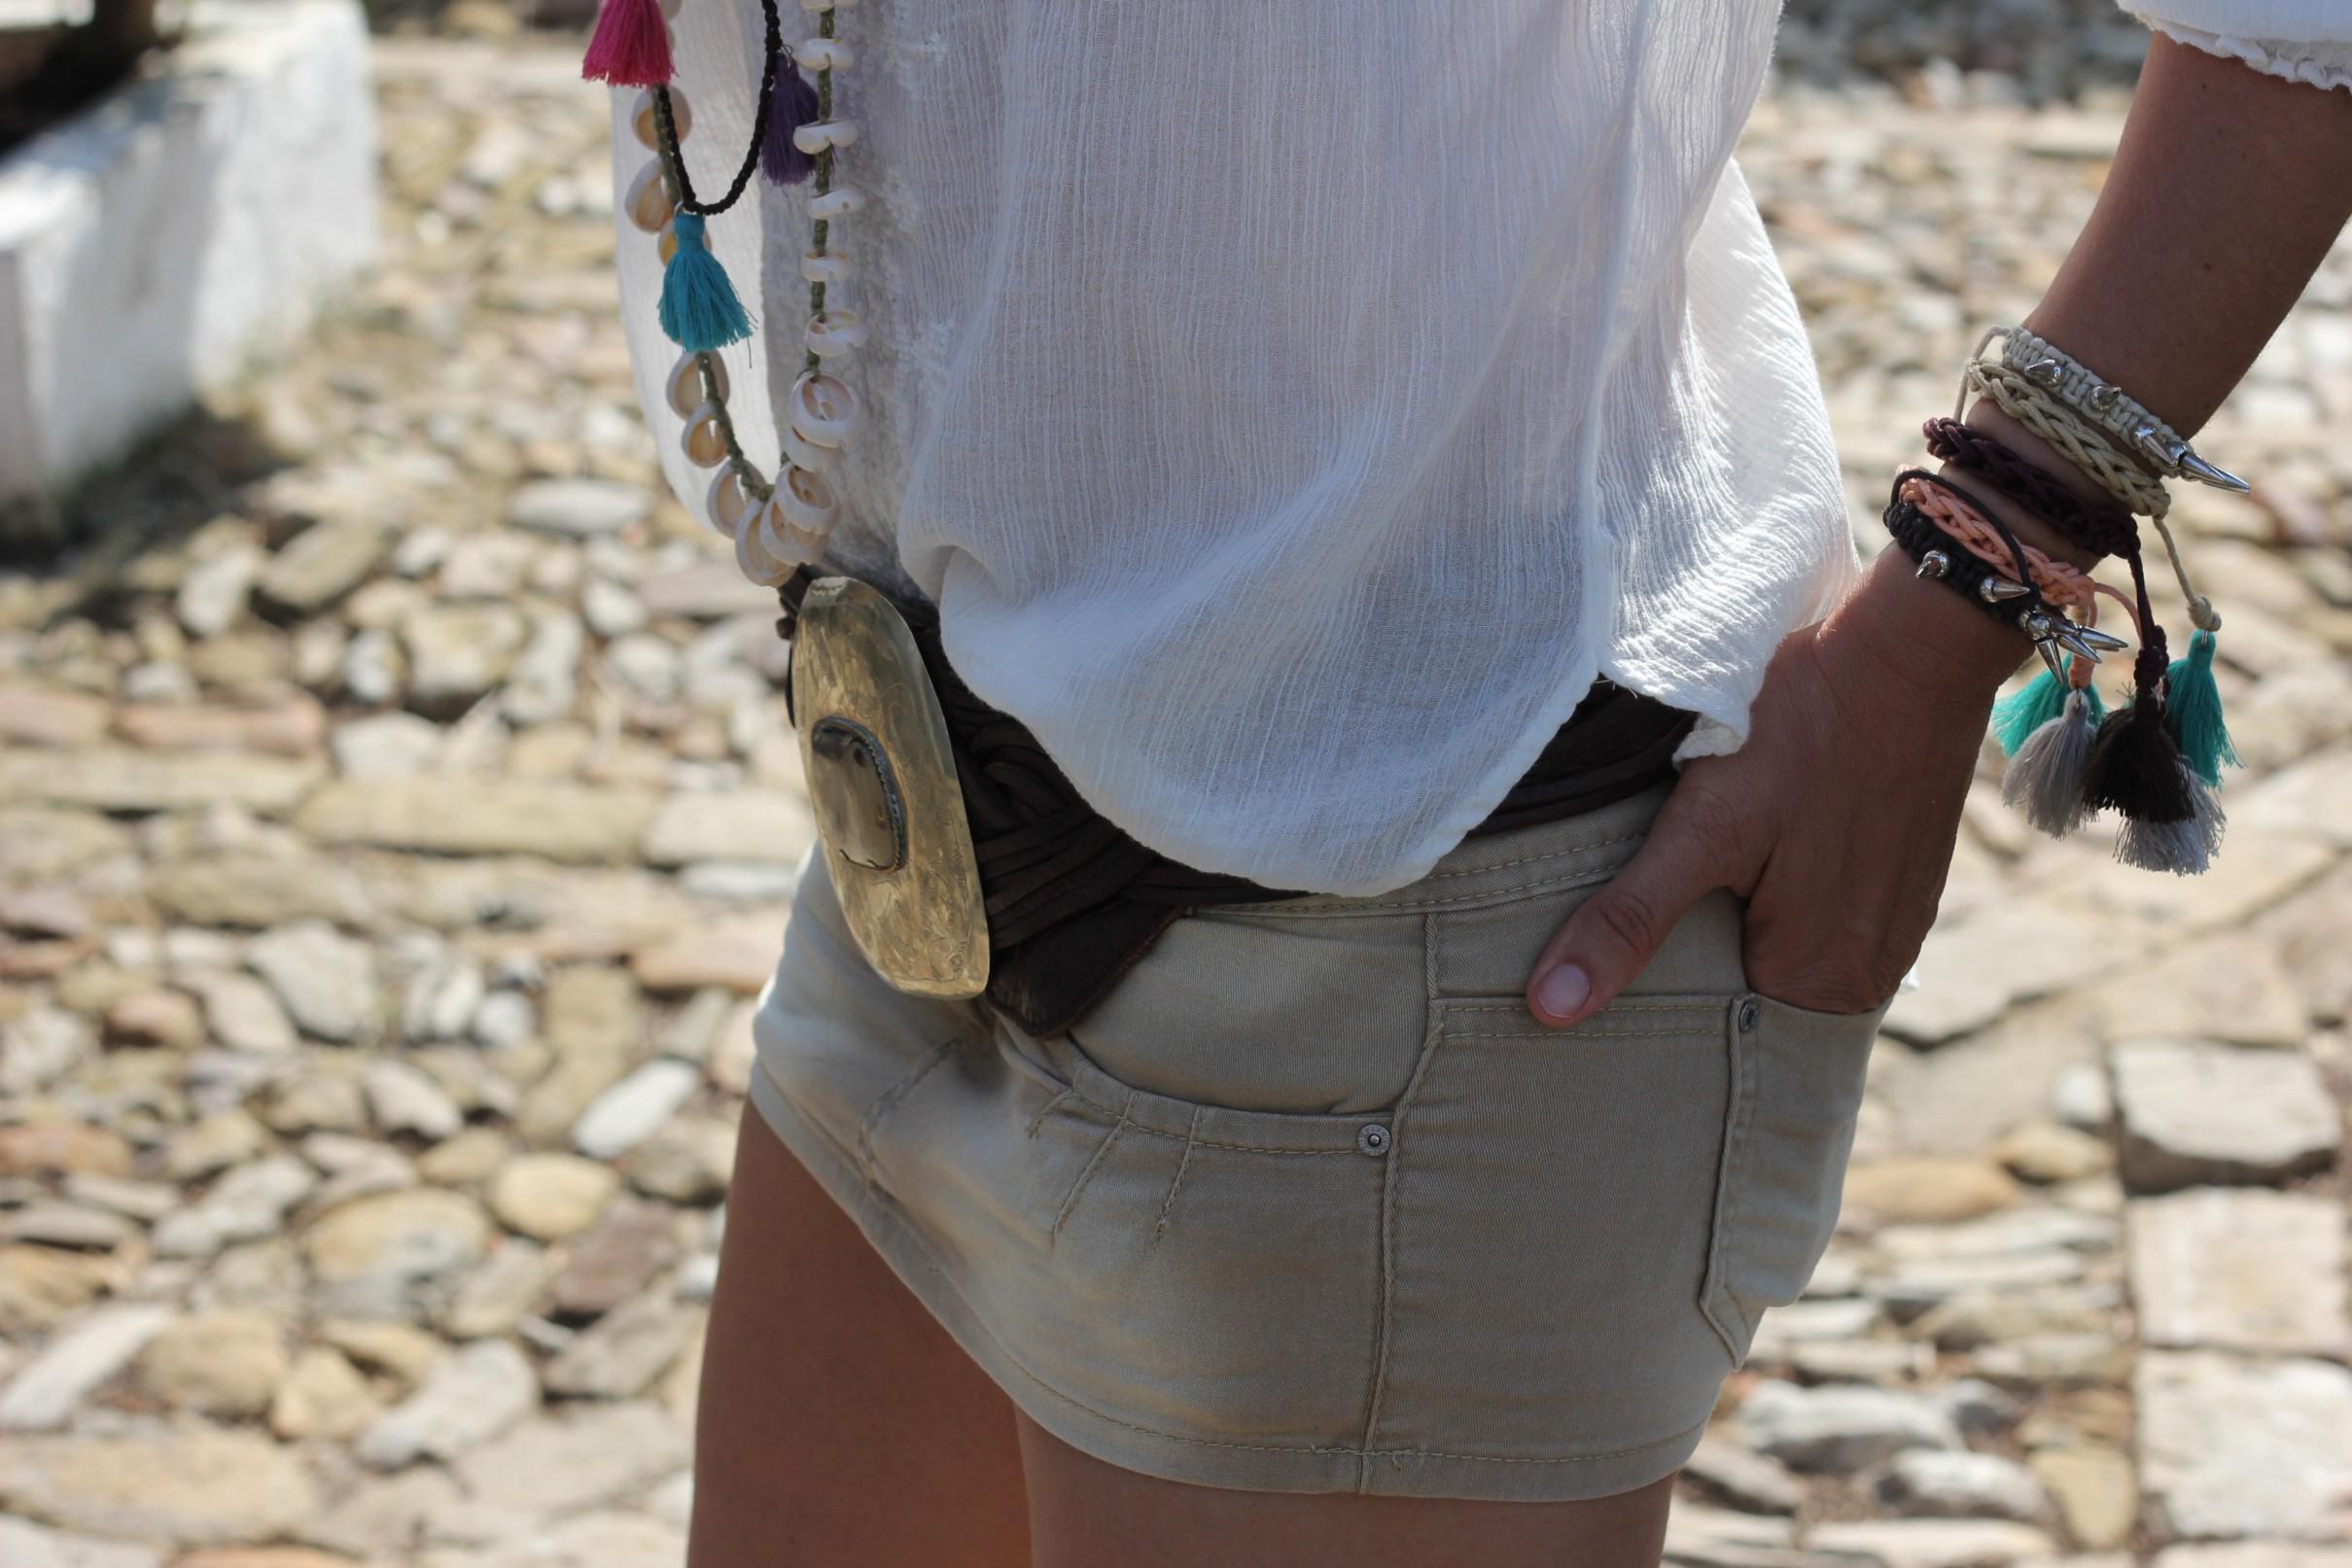 mini mini skirt and shorts-56439-mytenida